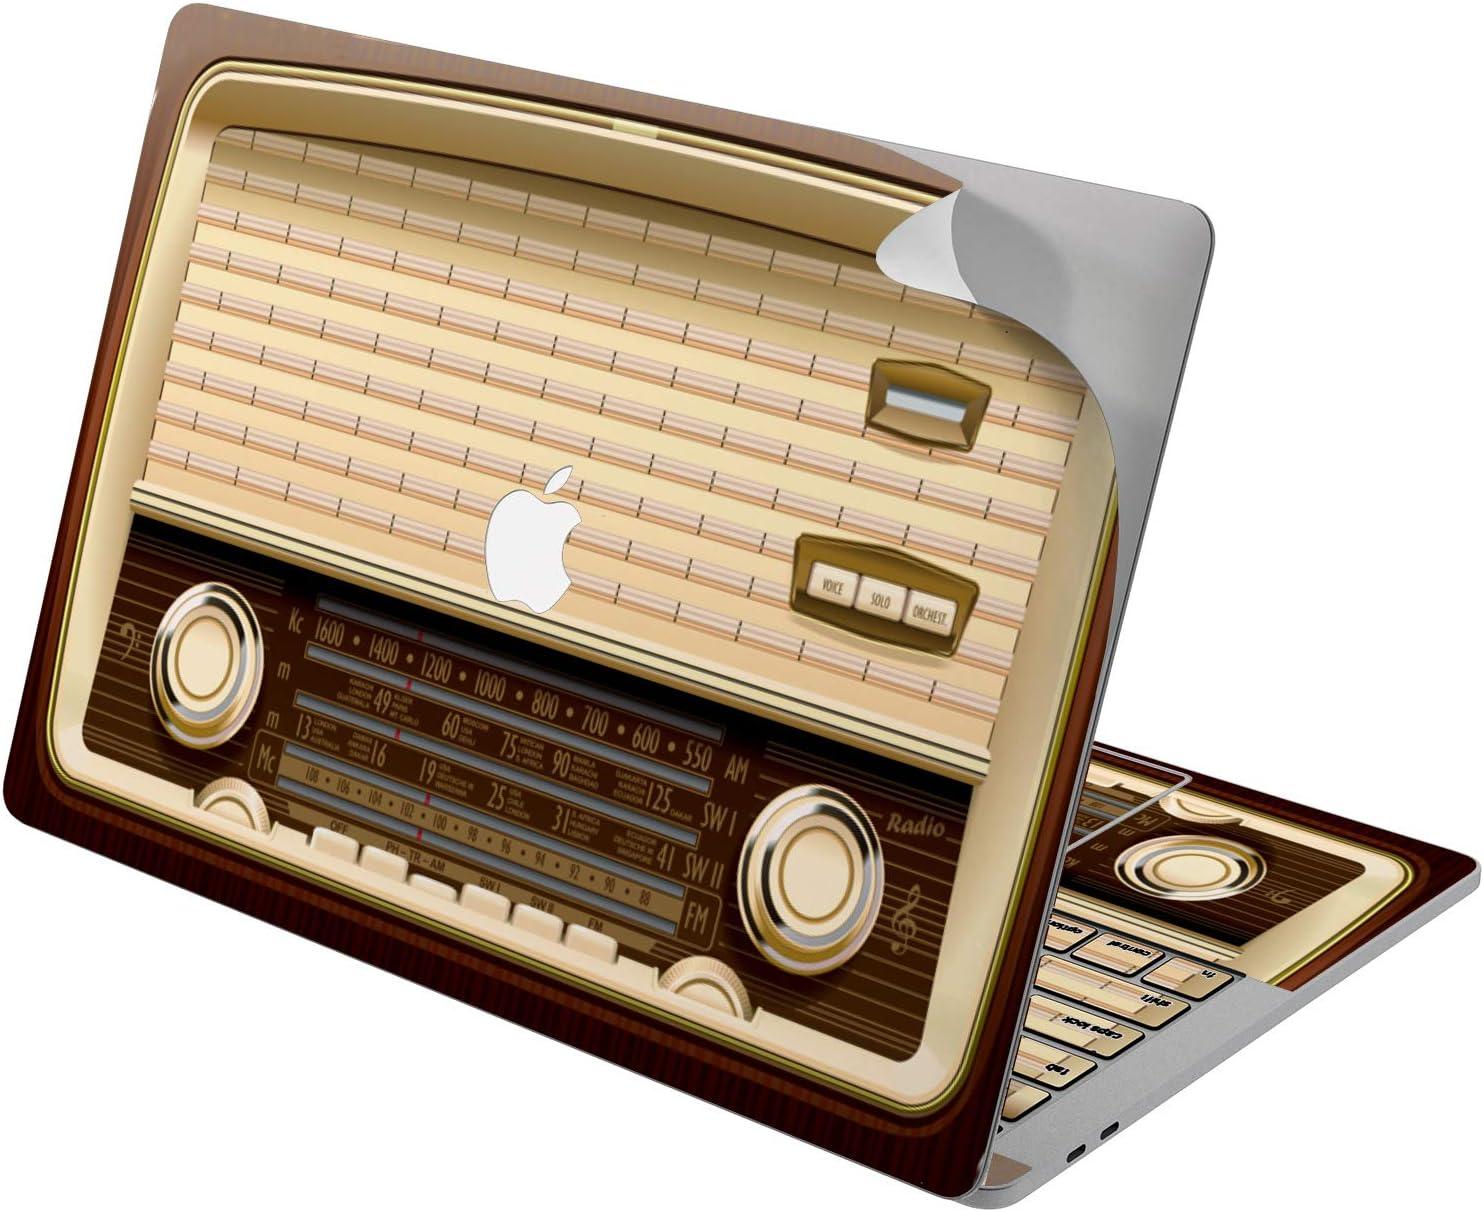 "Cavka Vinyl Decal Skin for Apple MacBook Pro 13"" 2019 15"" 2018 Air 13"" 2020 Retina 2015 Mac 11"" Mac 12"" Print Unique Radio Sticker Pattern Protective Vintage Design Cover Old Fashioned Laptop Retro"